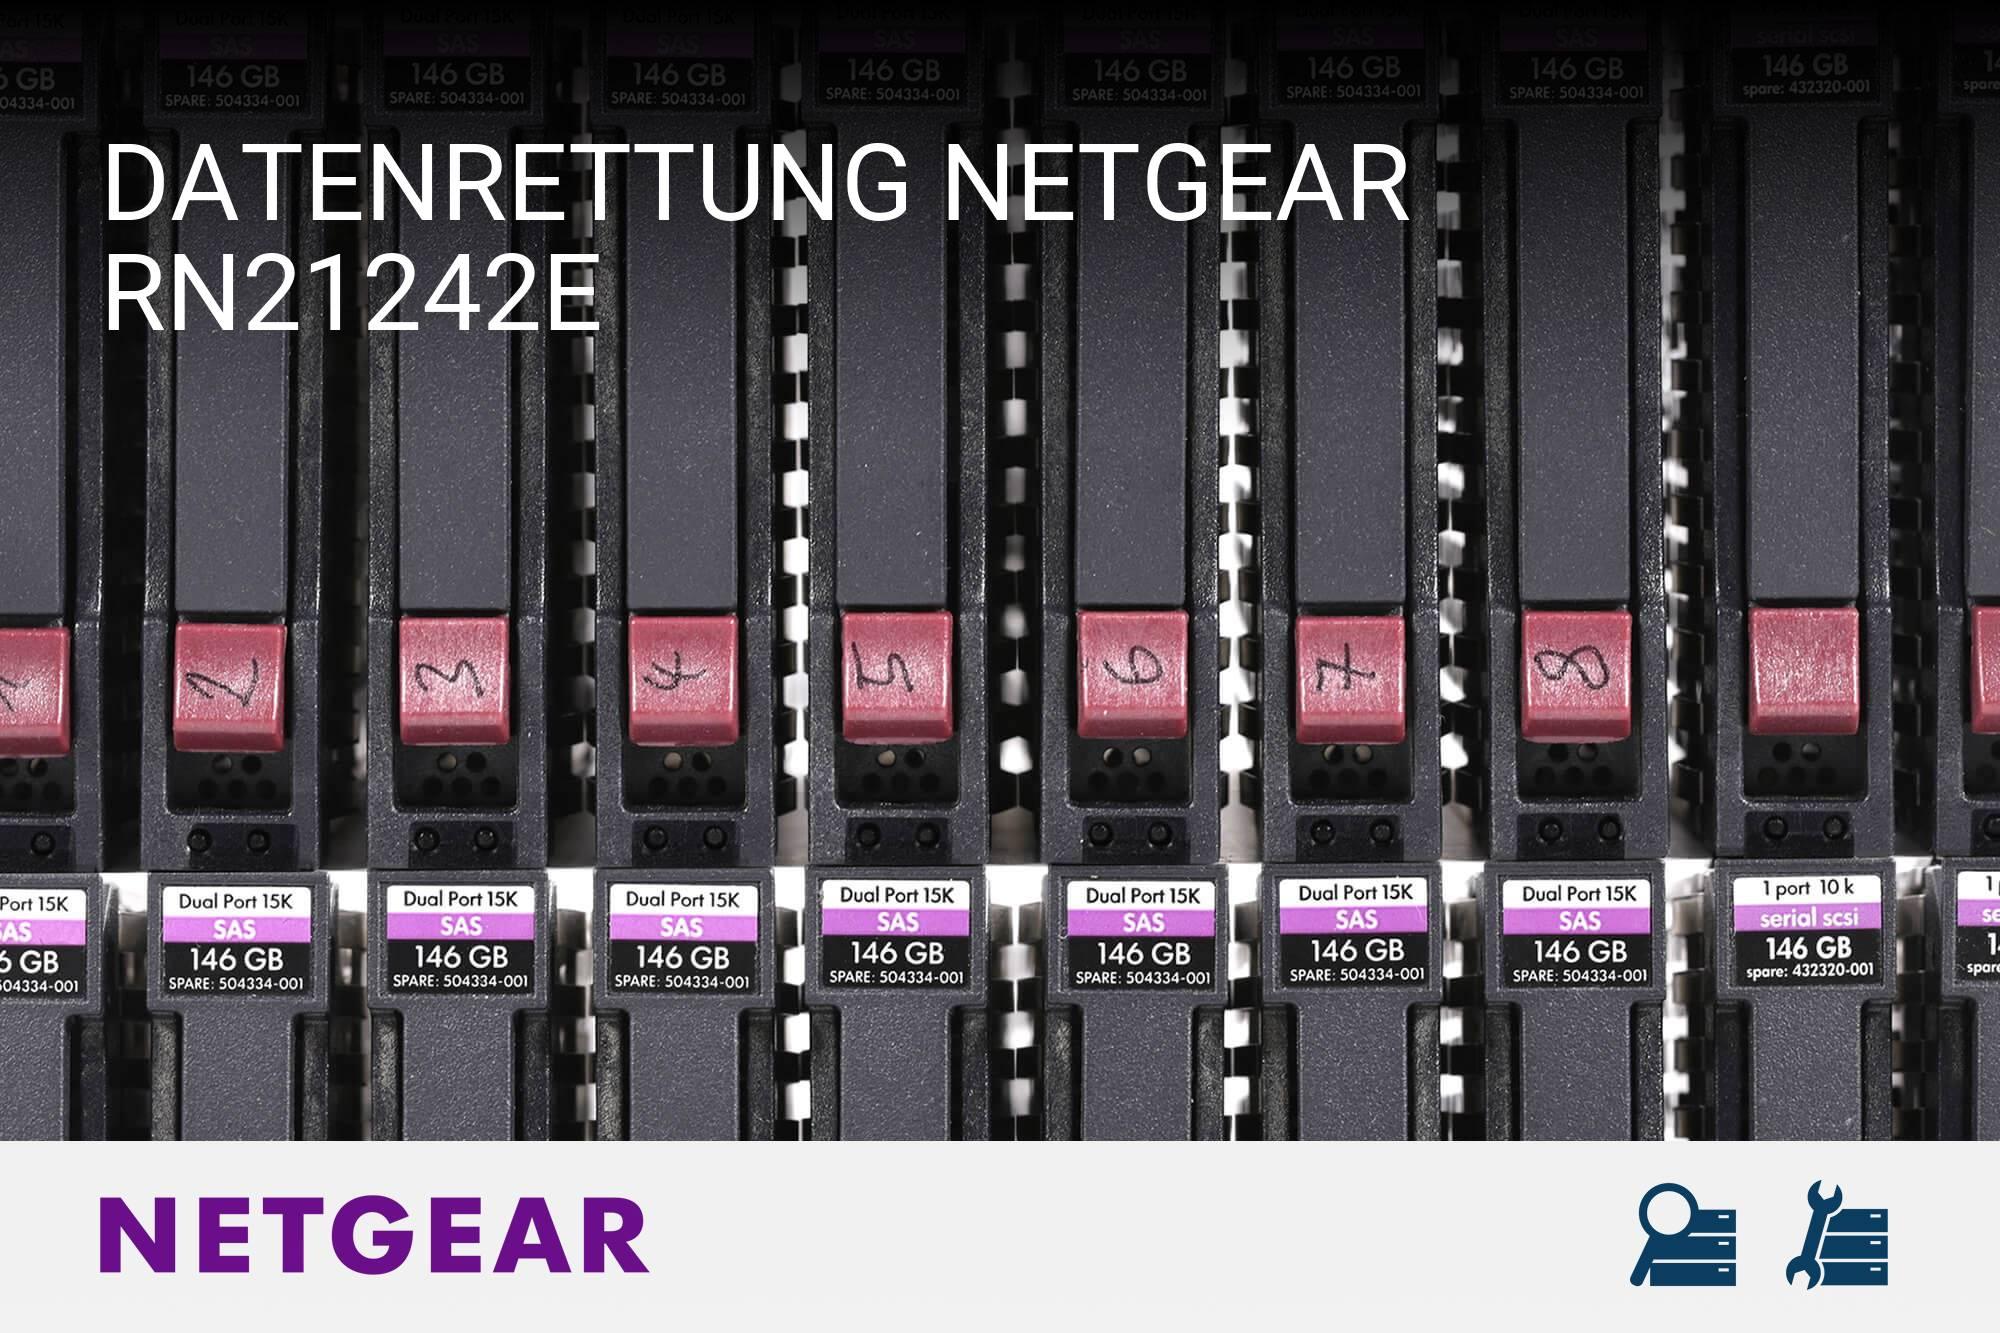 Netgear RN21242E